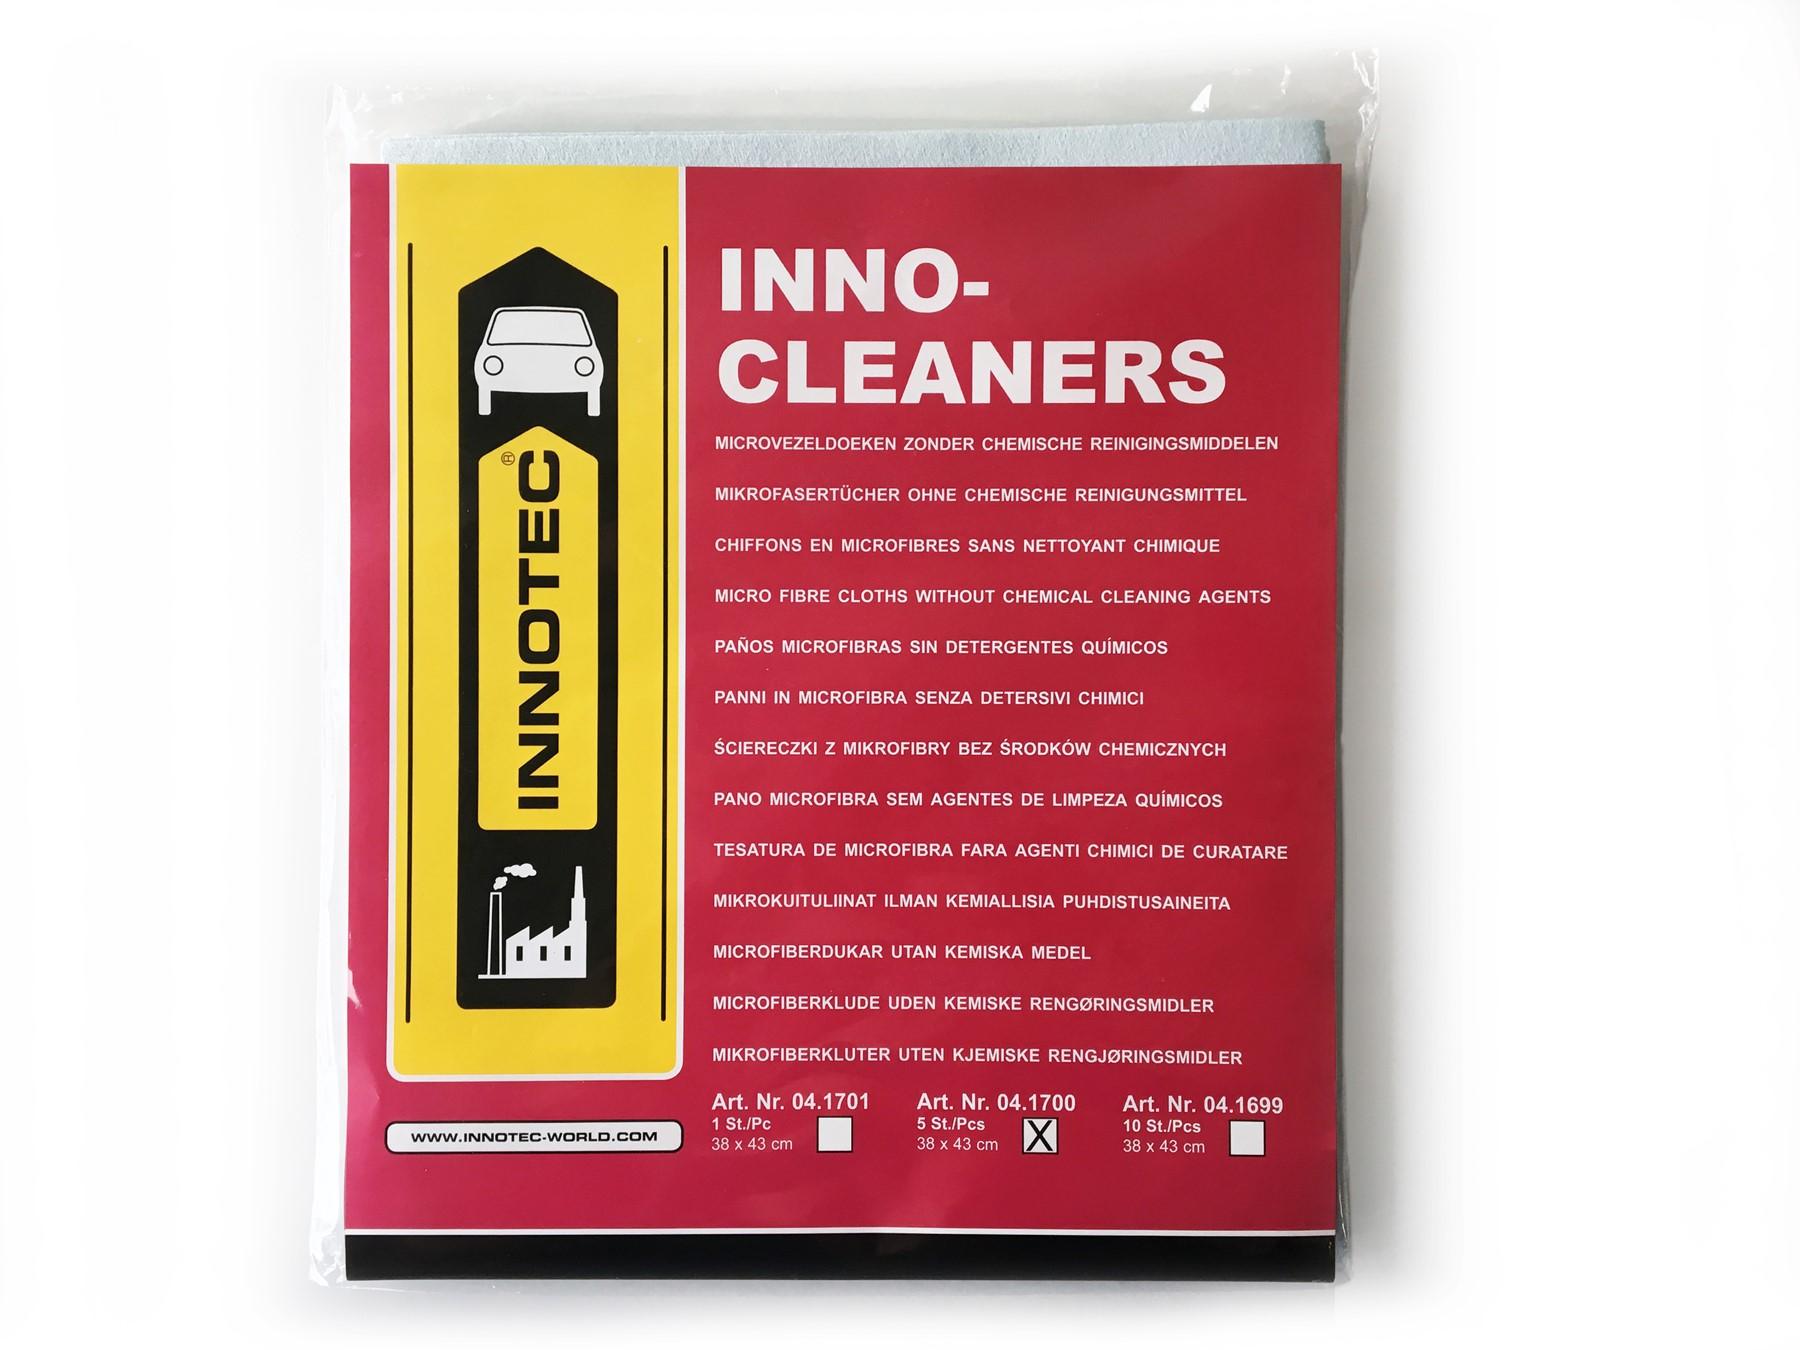 1296_Inno-Cleaners_5.jpg